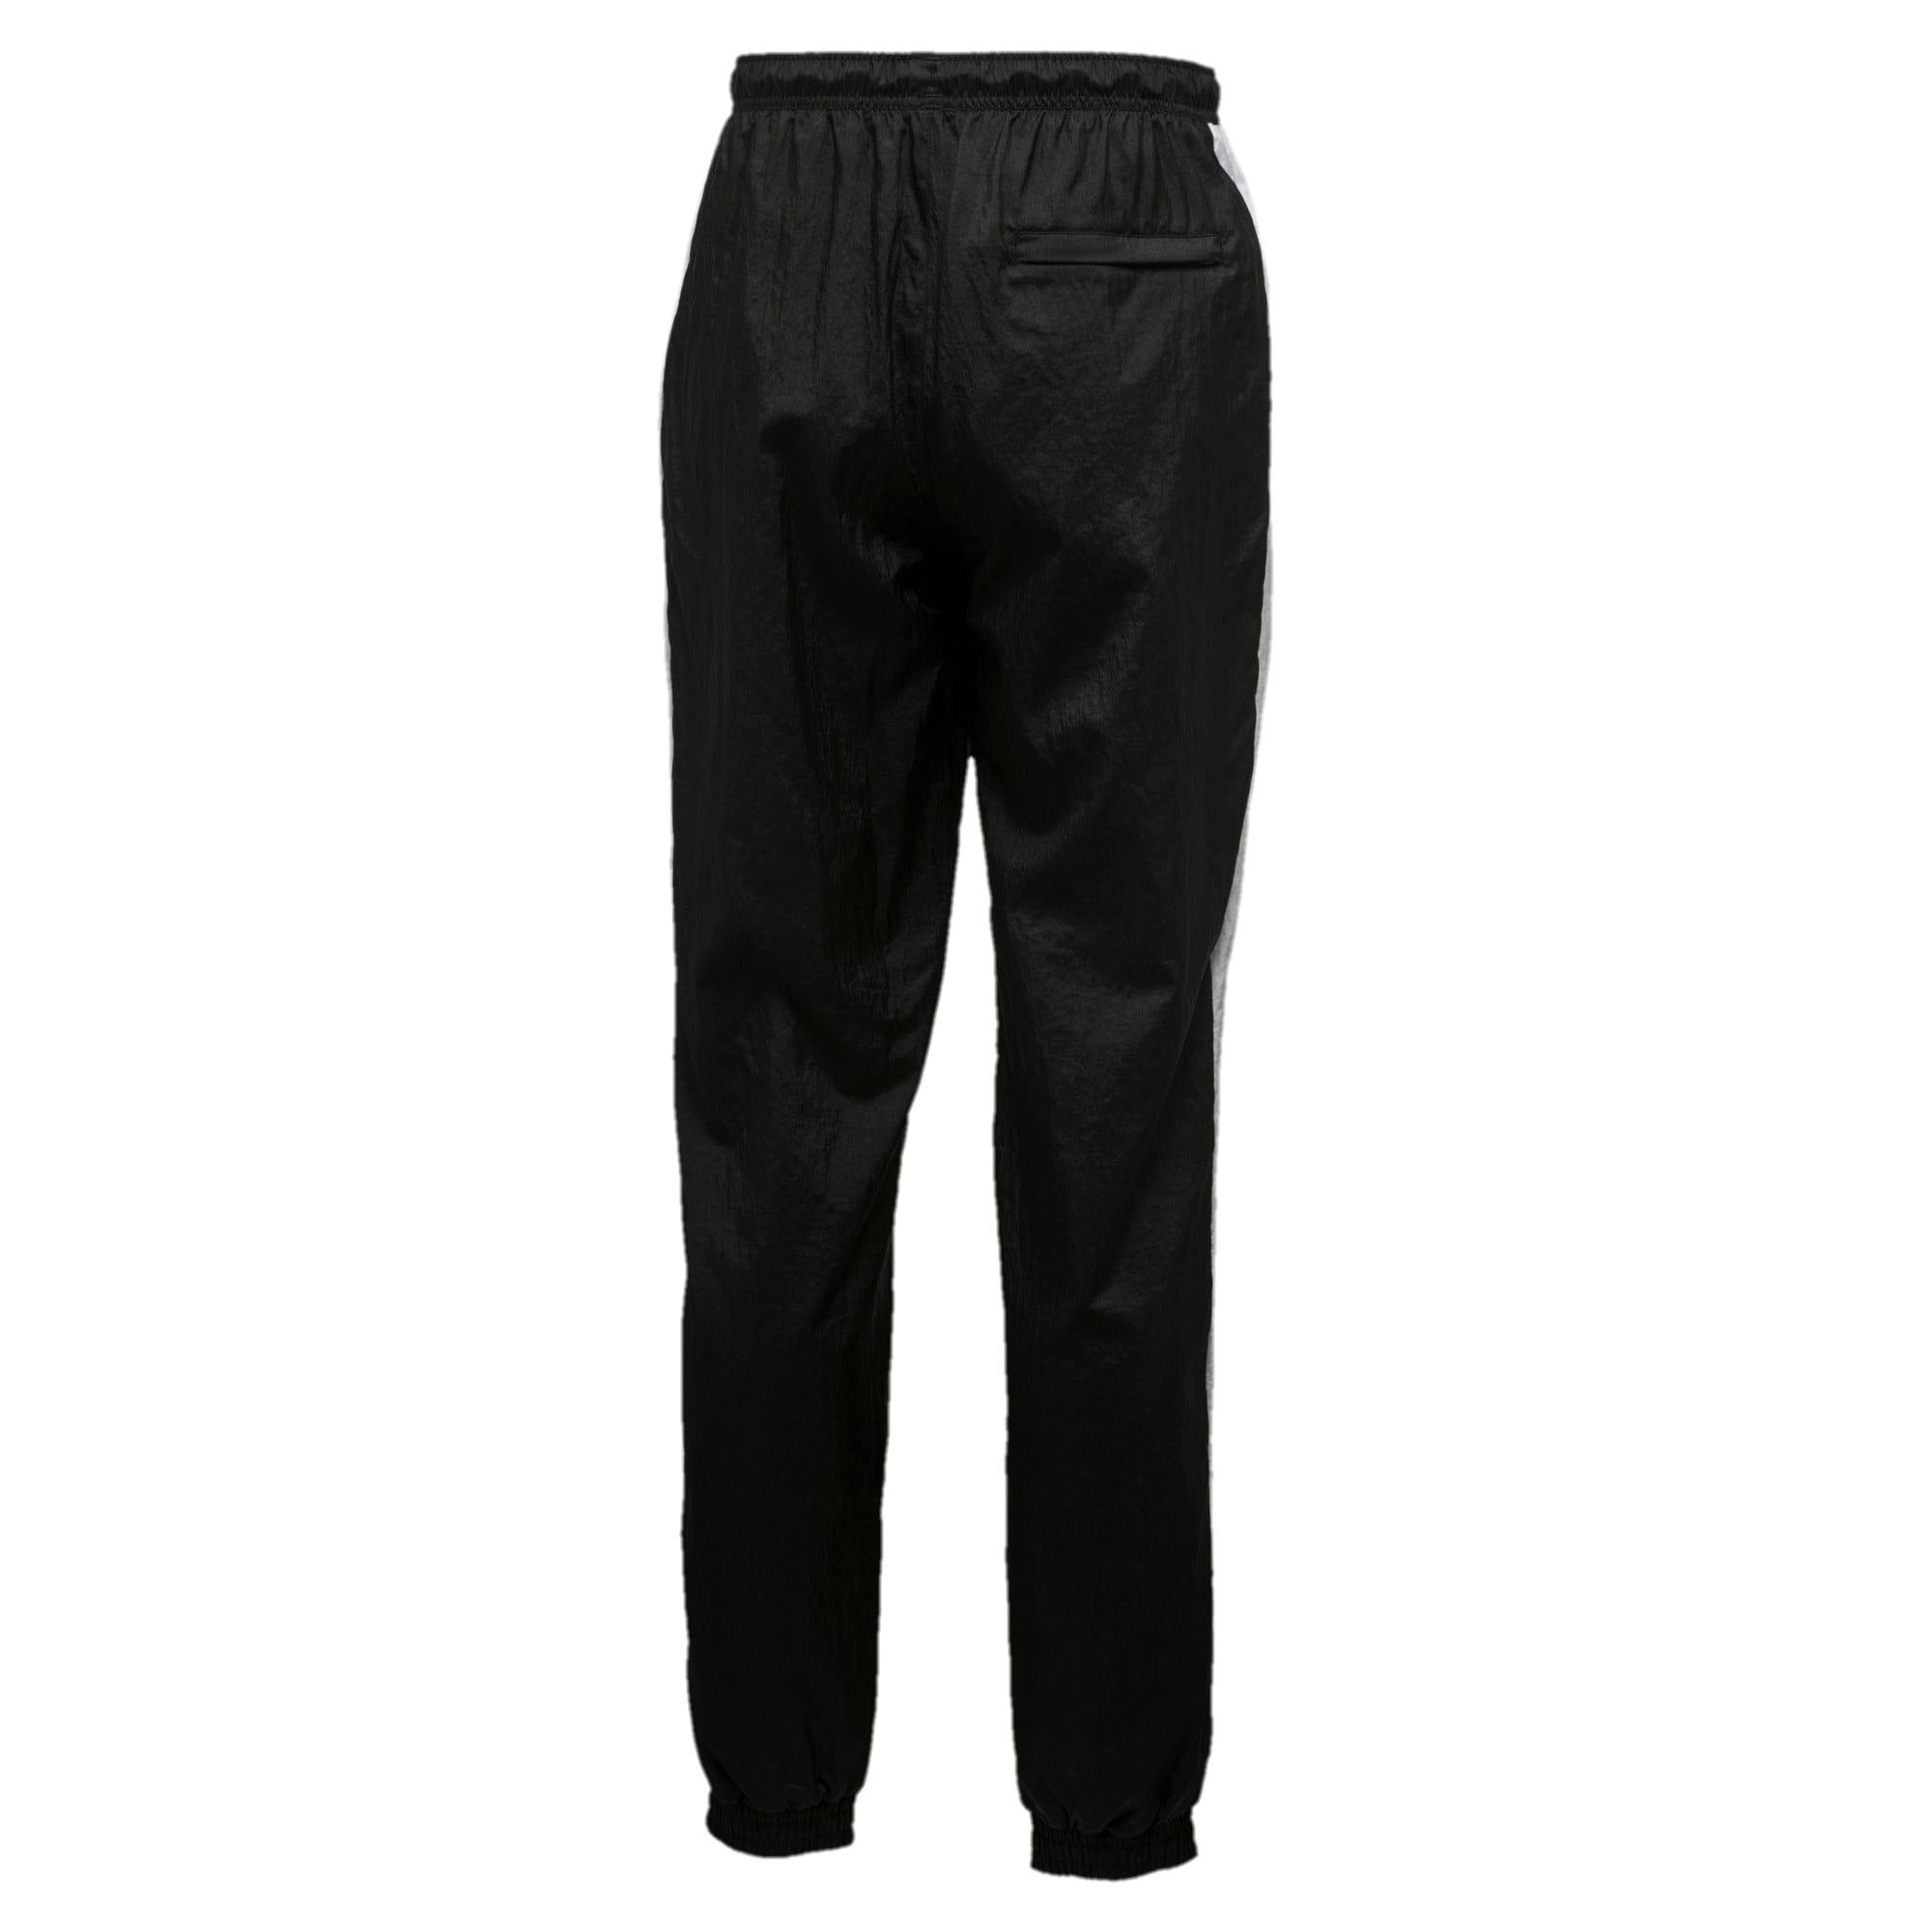 Thumbnail 2 of T7 BBoy Track Pants, Puma Black-white, medium-IND